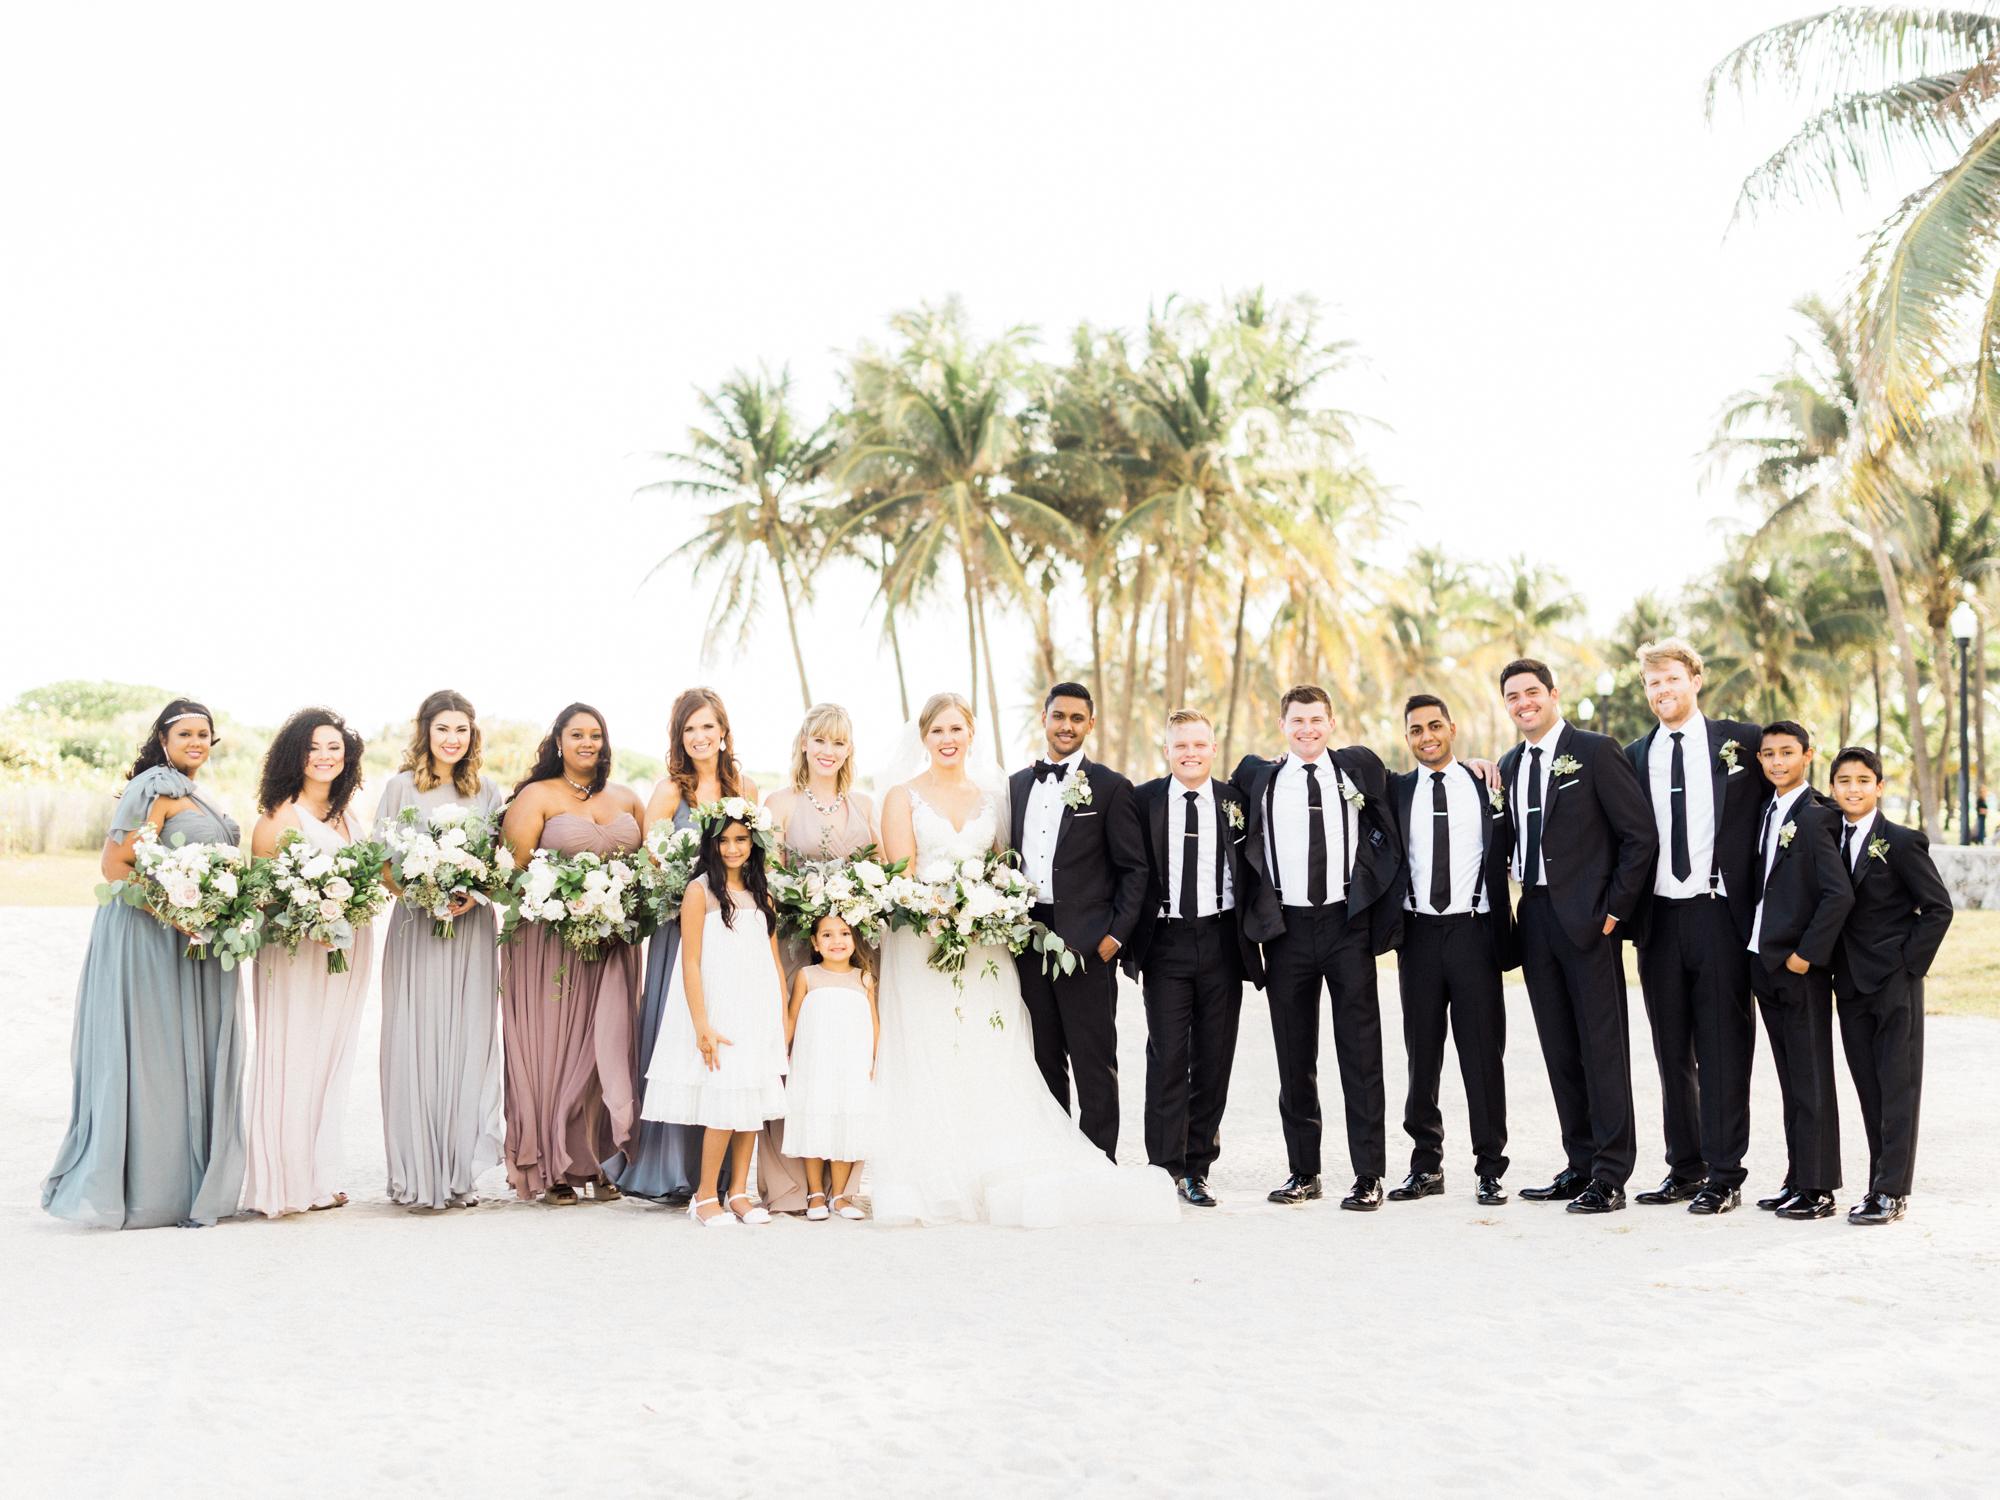 betsy-hotel-wedding-south-beach-miami-charleston-south-carolina-destination-wedding-photographer-14.jpg